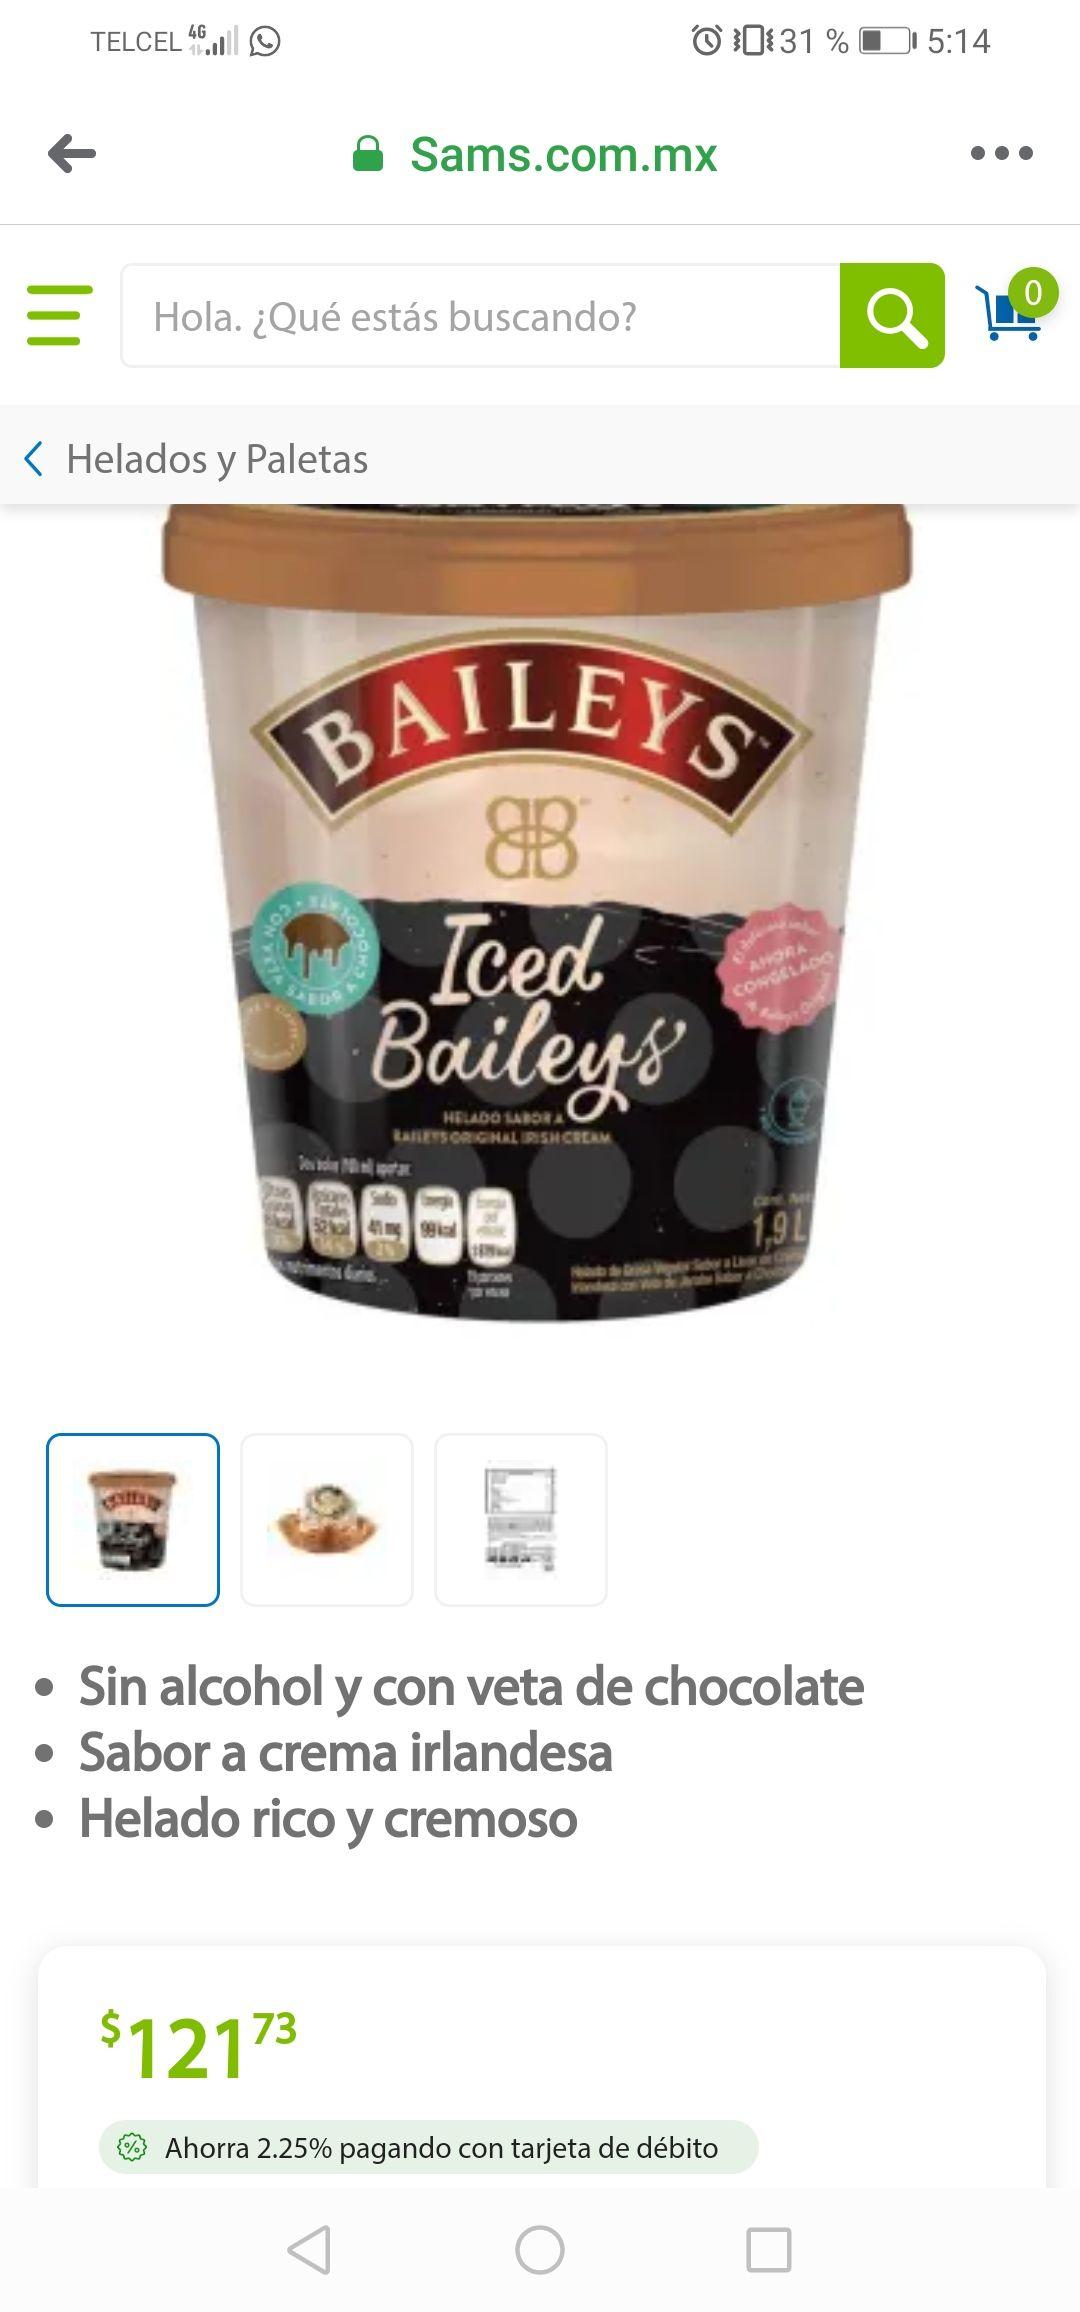 Sam's club: 1.9 lts de helado Baileys